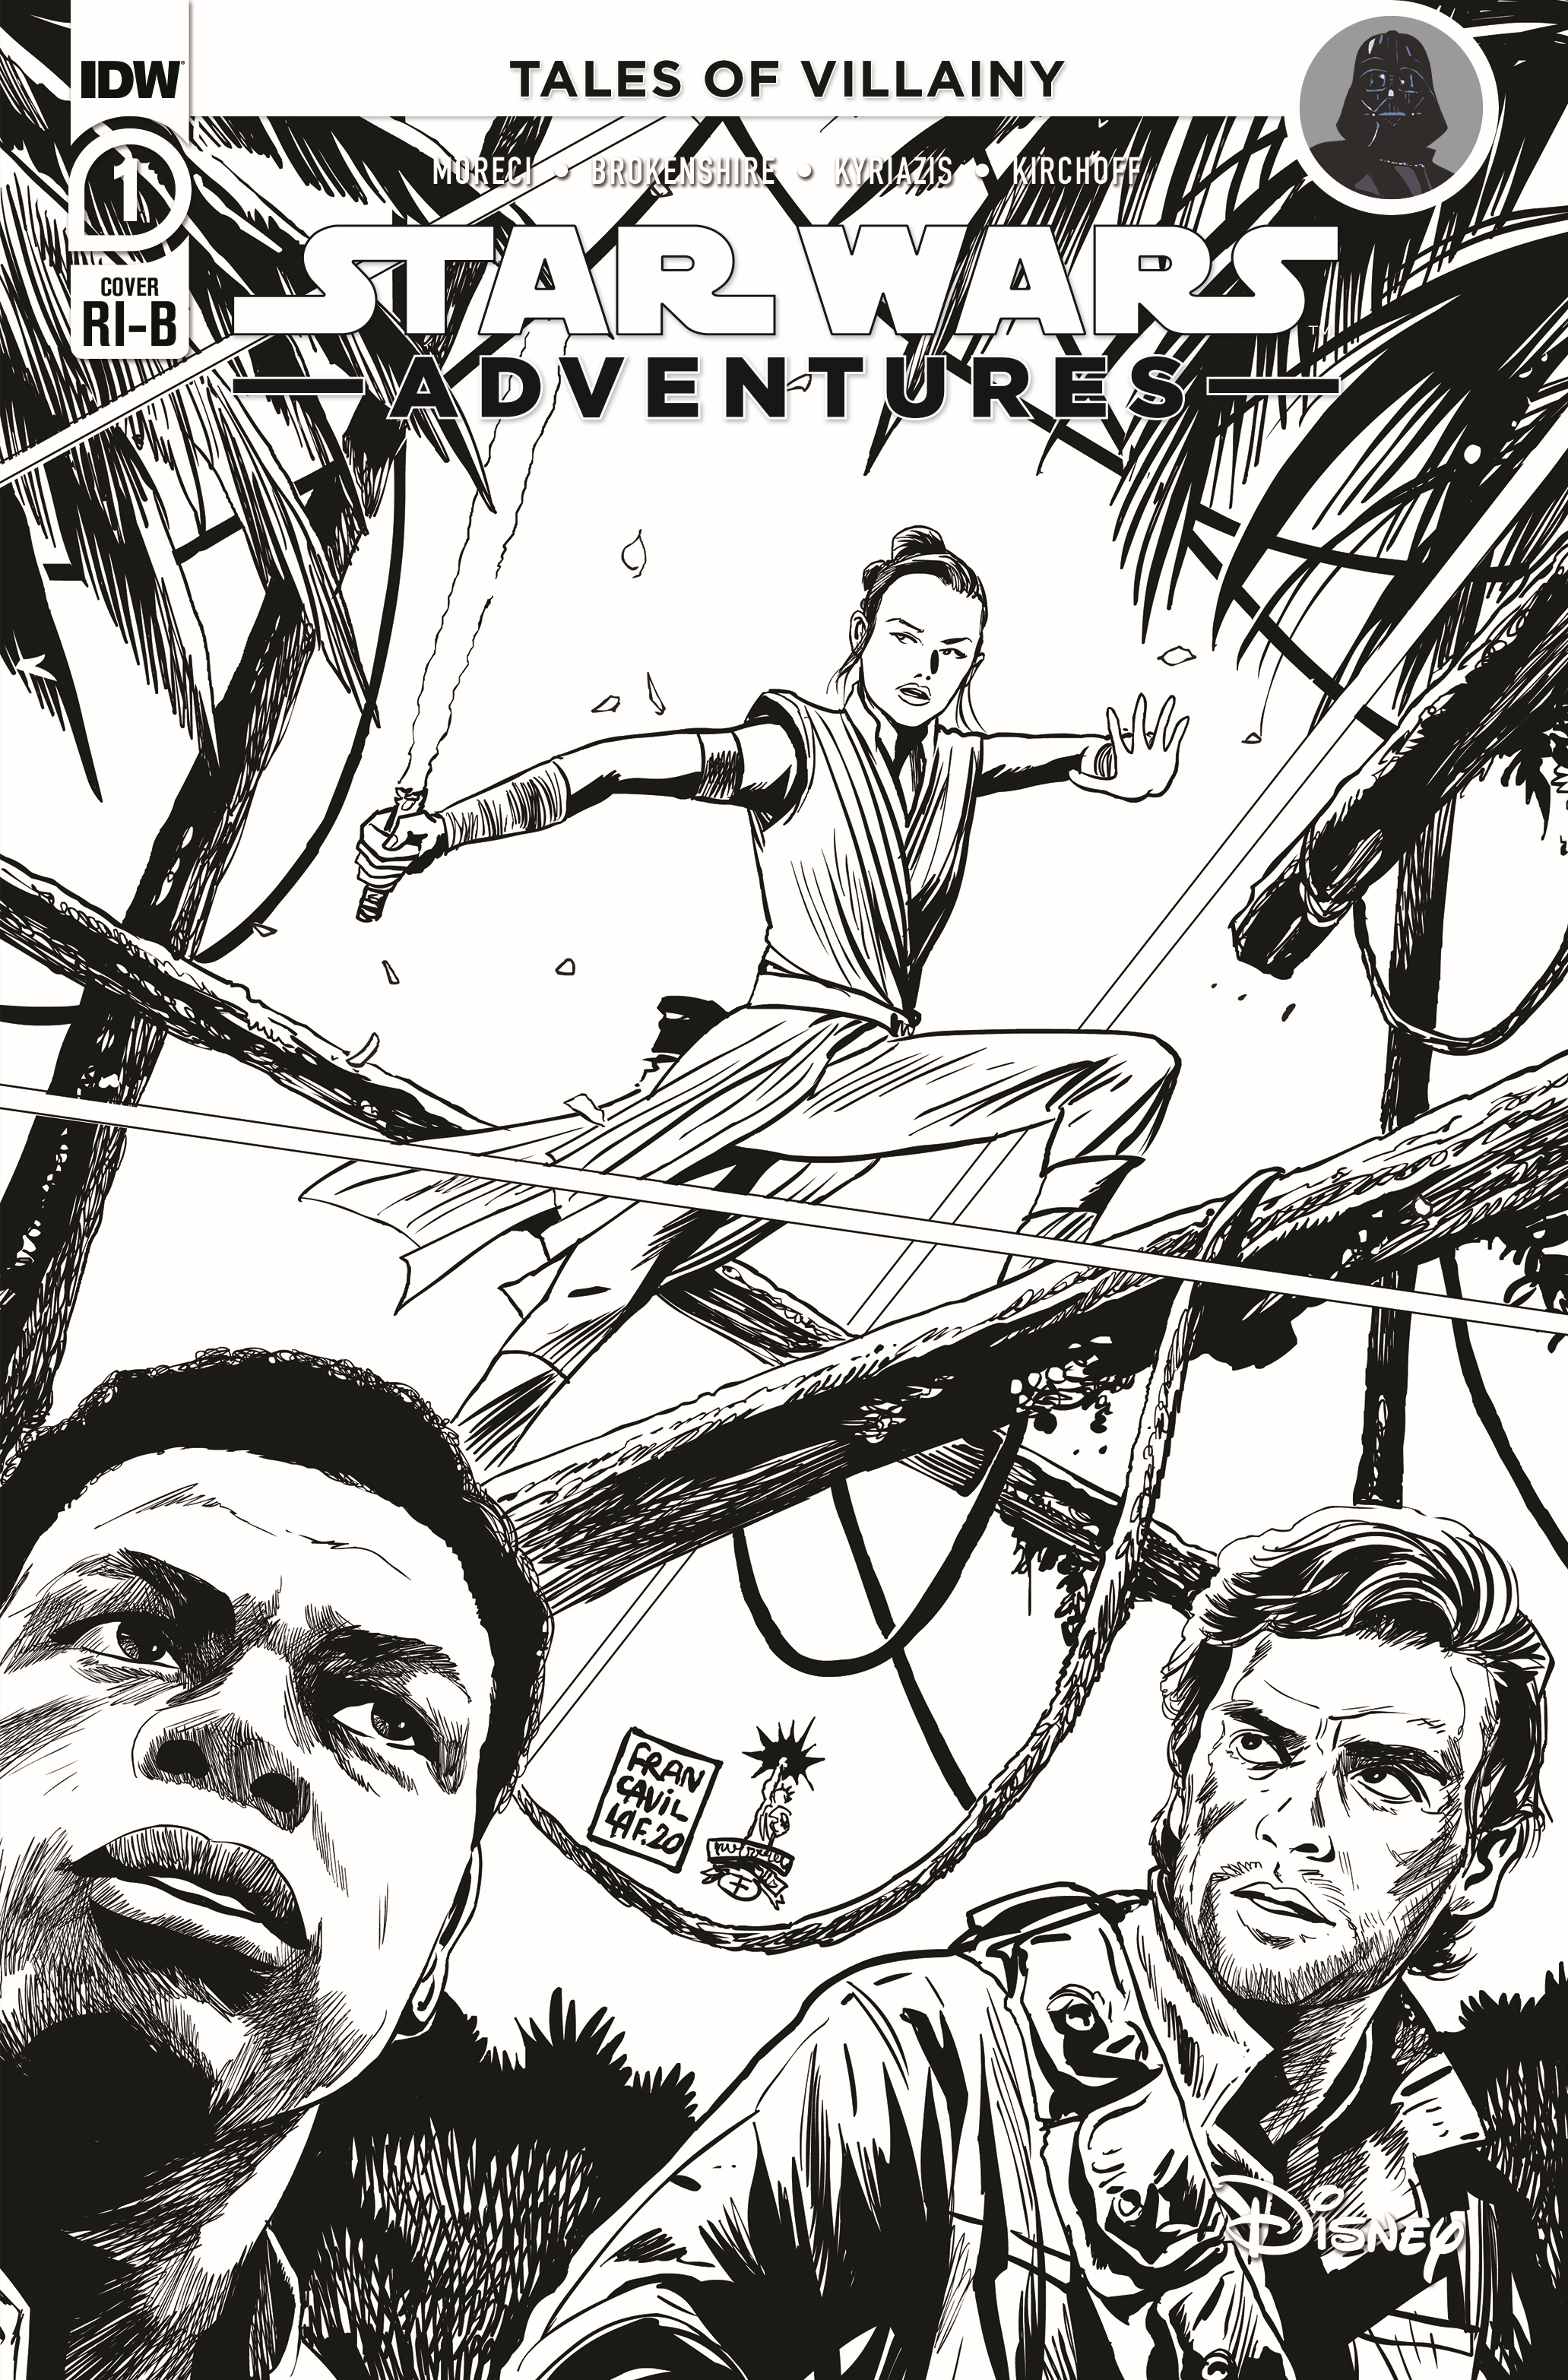 Star Wars Adventures #1 (Francesco Francavilla Black & White Variant Cover) (07.10.2020)